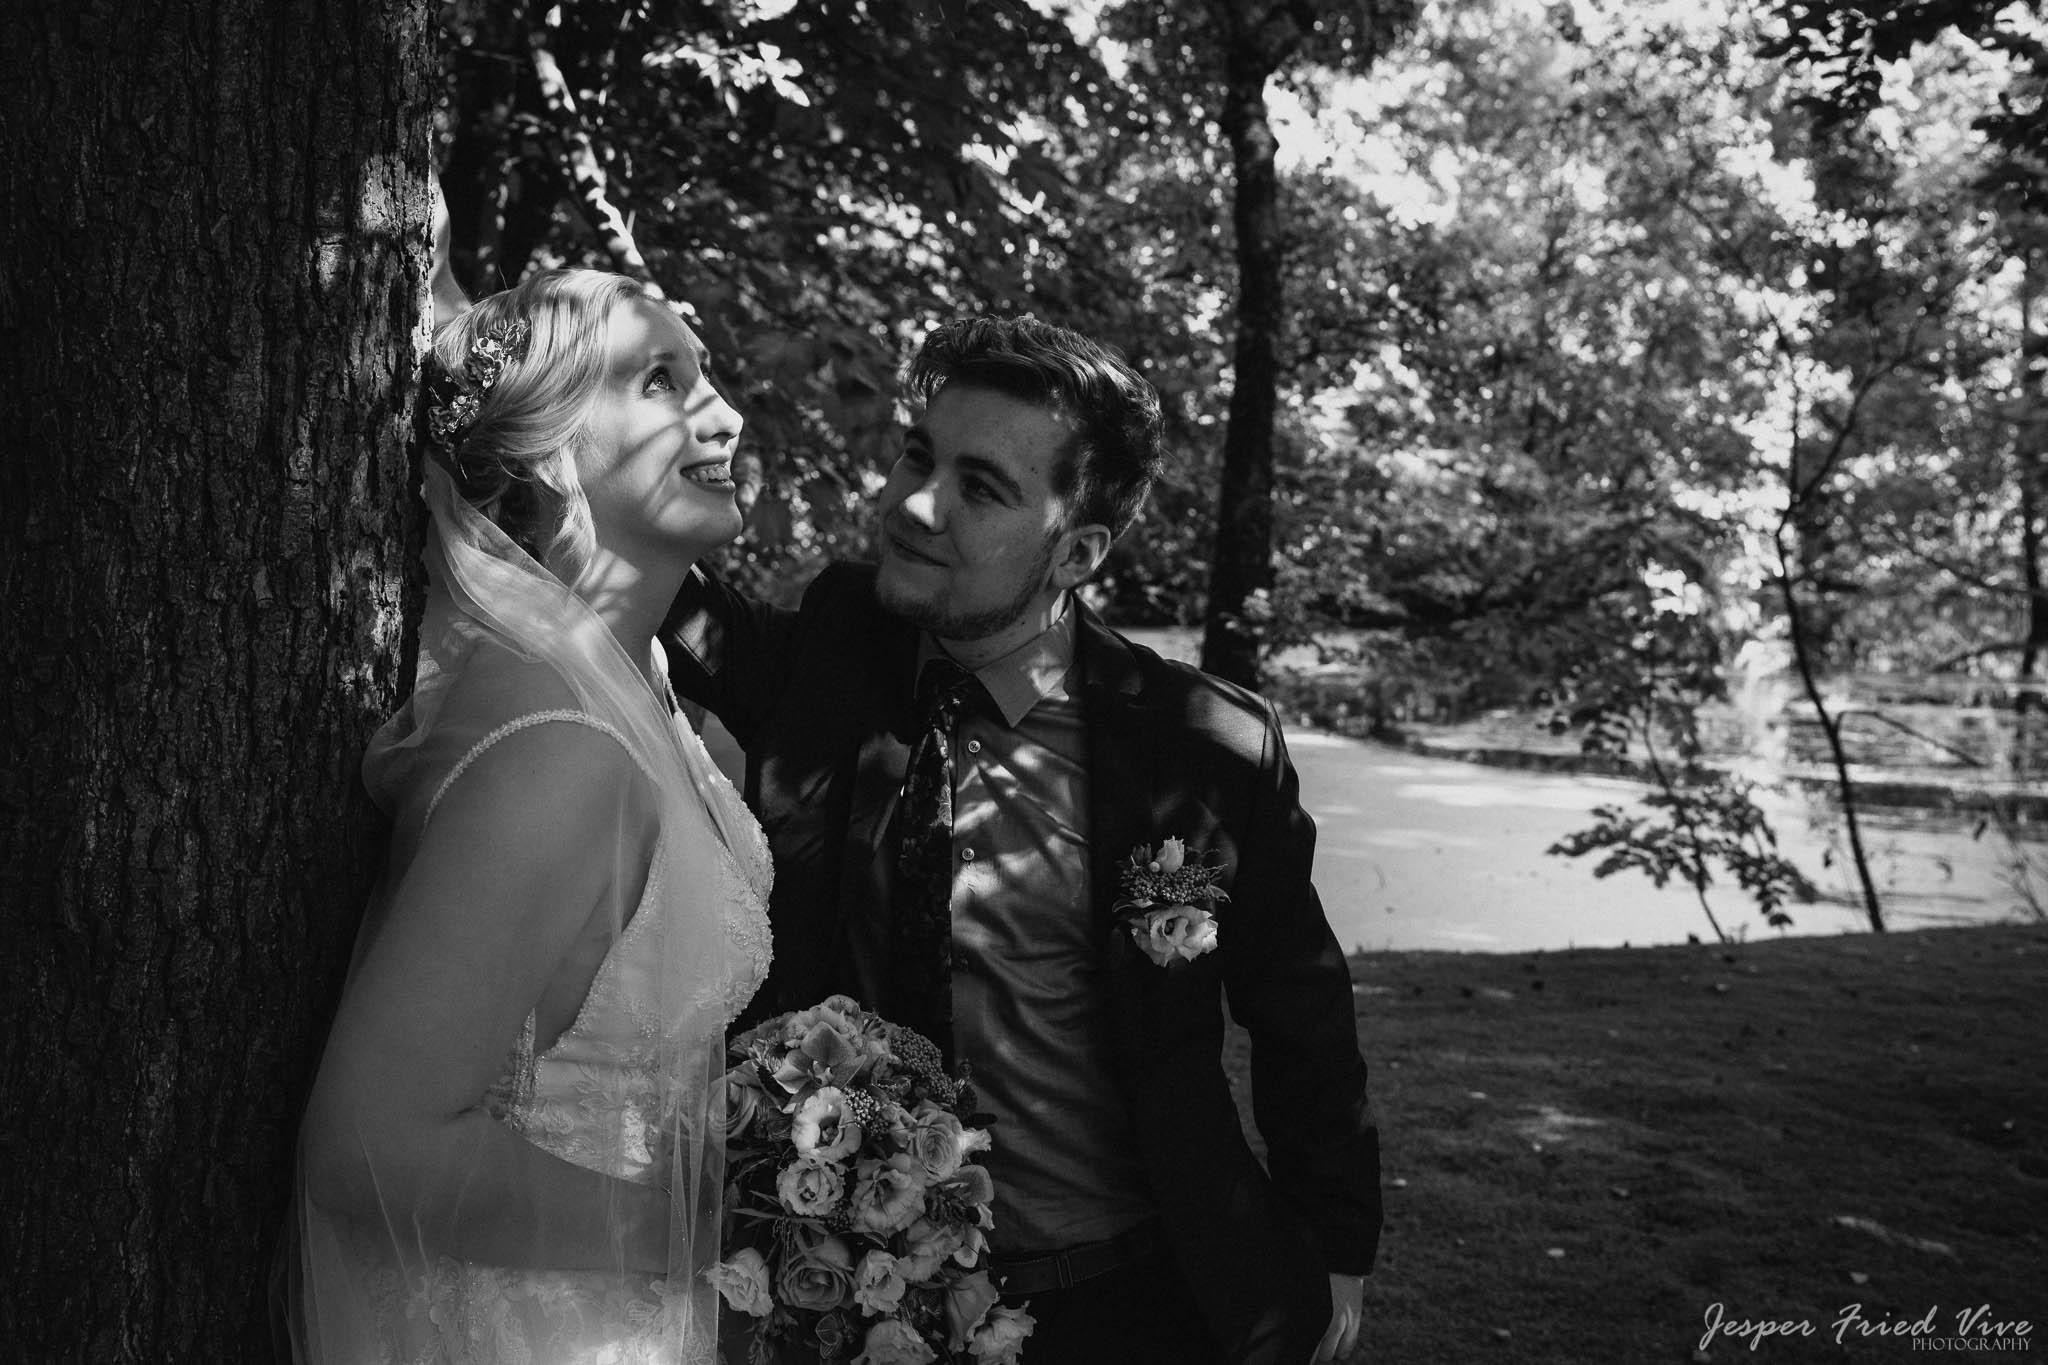 Bryllupsfotograf i Odense - Bryllupsbillede